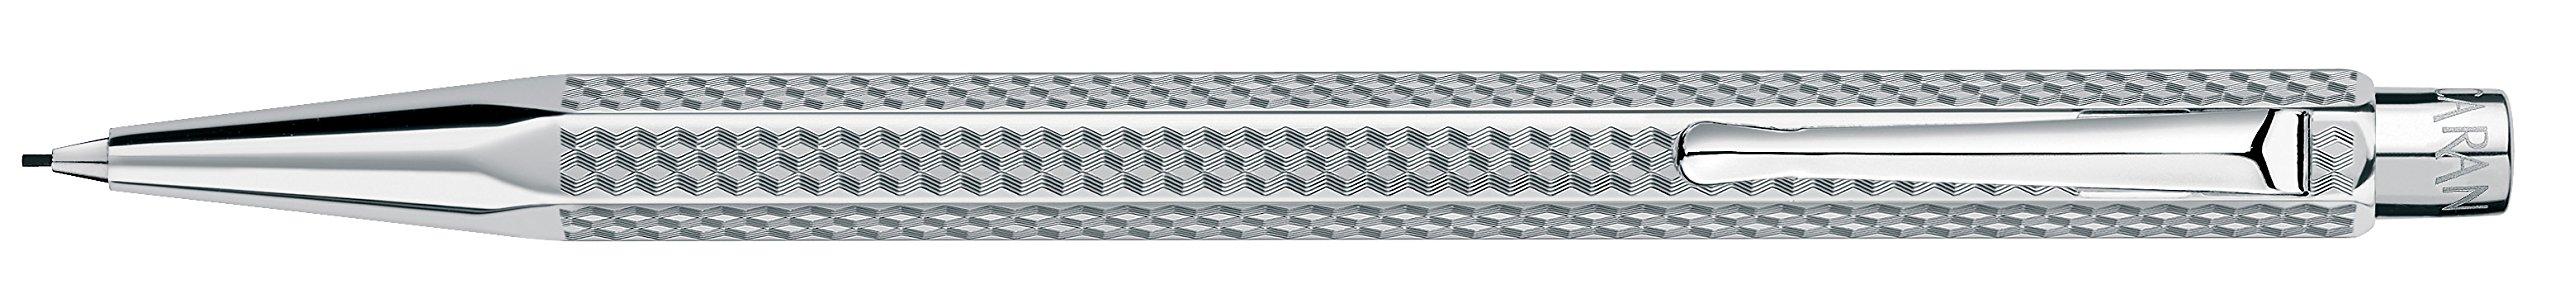 Caran d'Ache Ecridor Cubrik Silver 0.7mm Mechanical Pencil by Caran D'ache (Image #1)